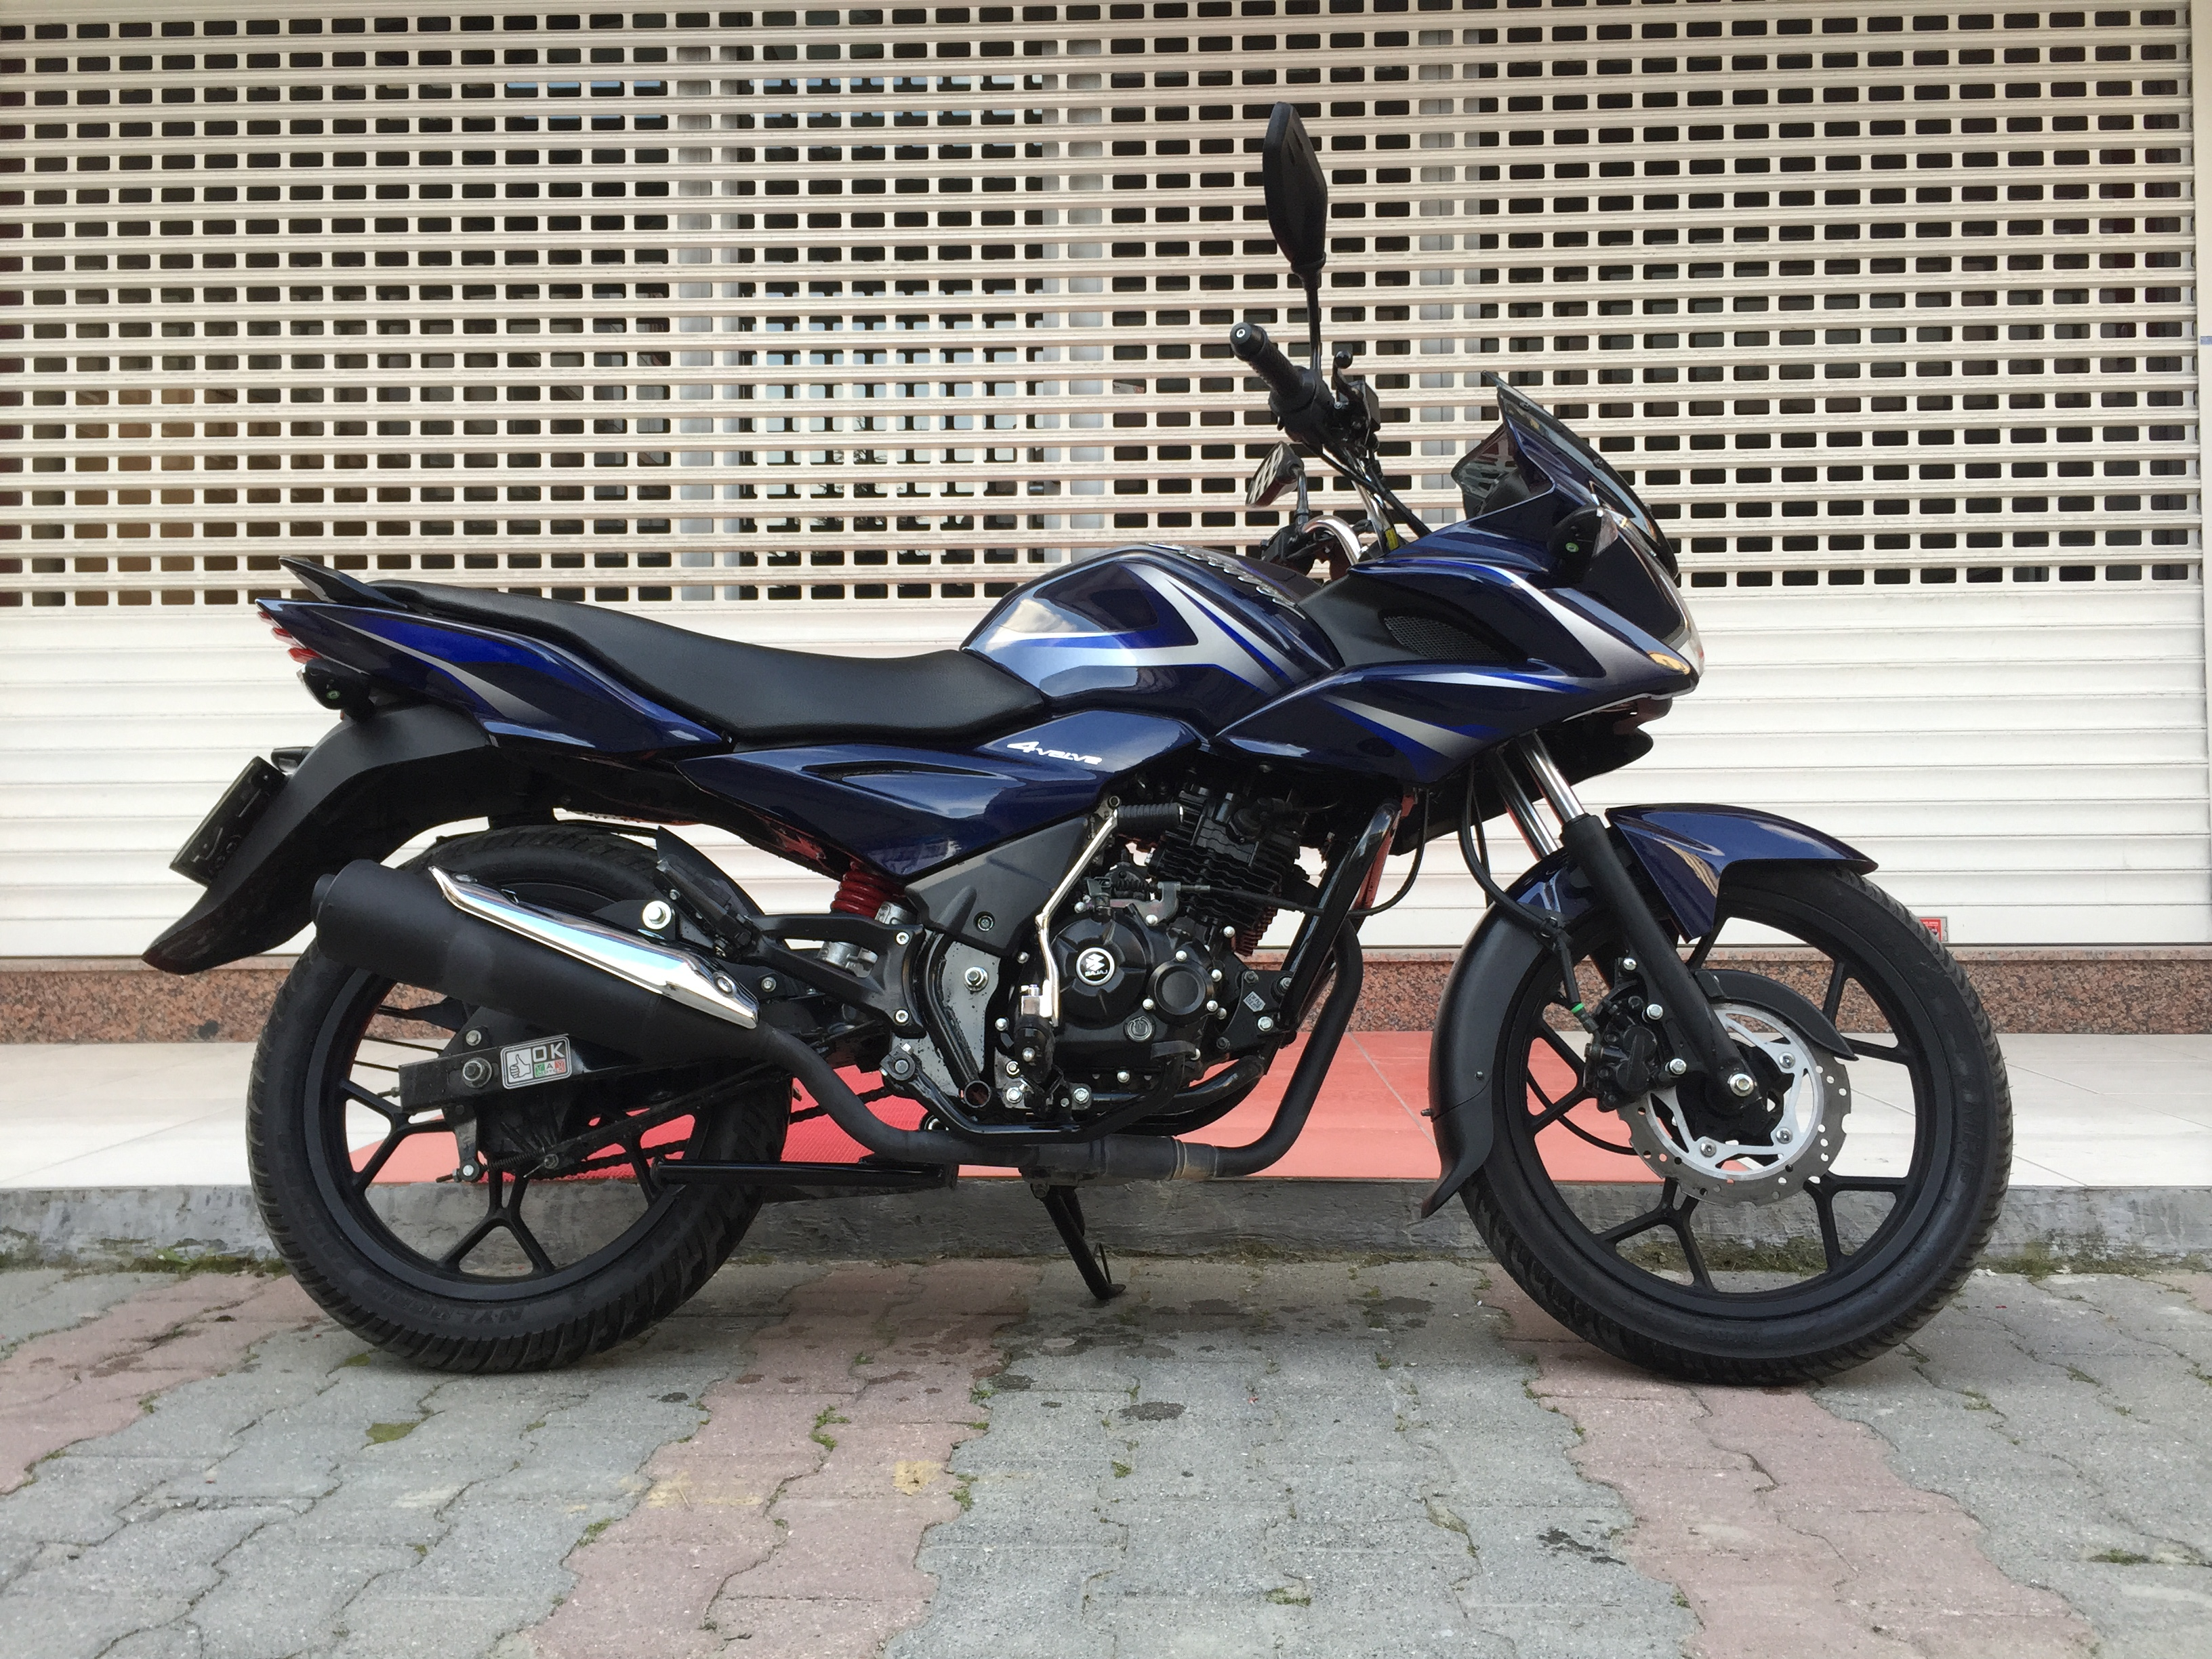 Hyosung motosiklet tanıtımı